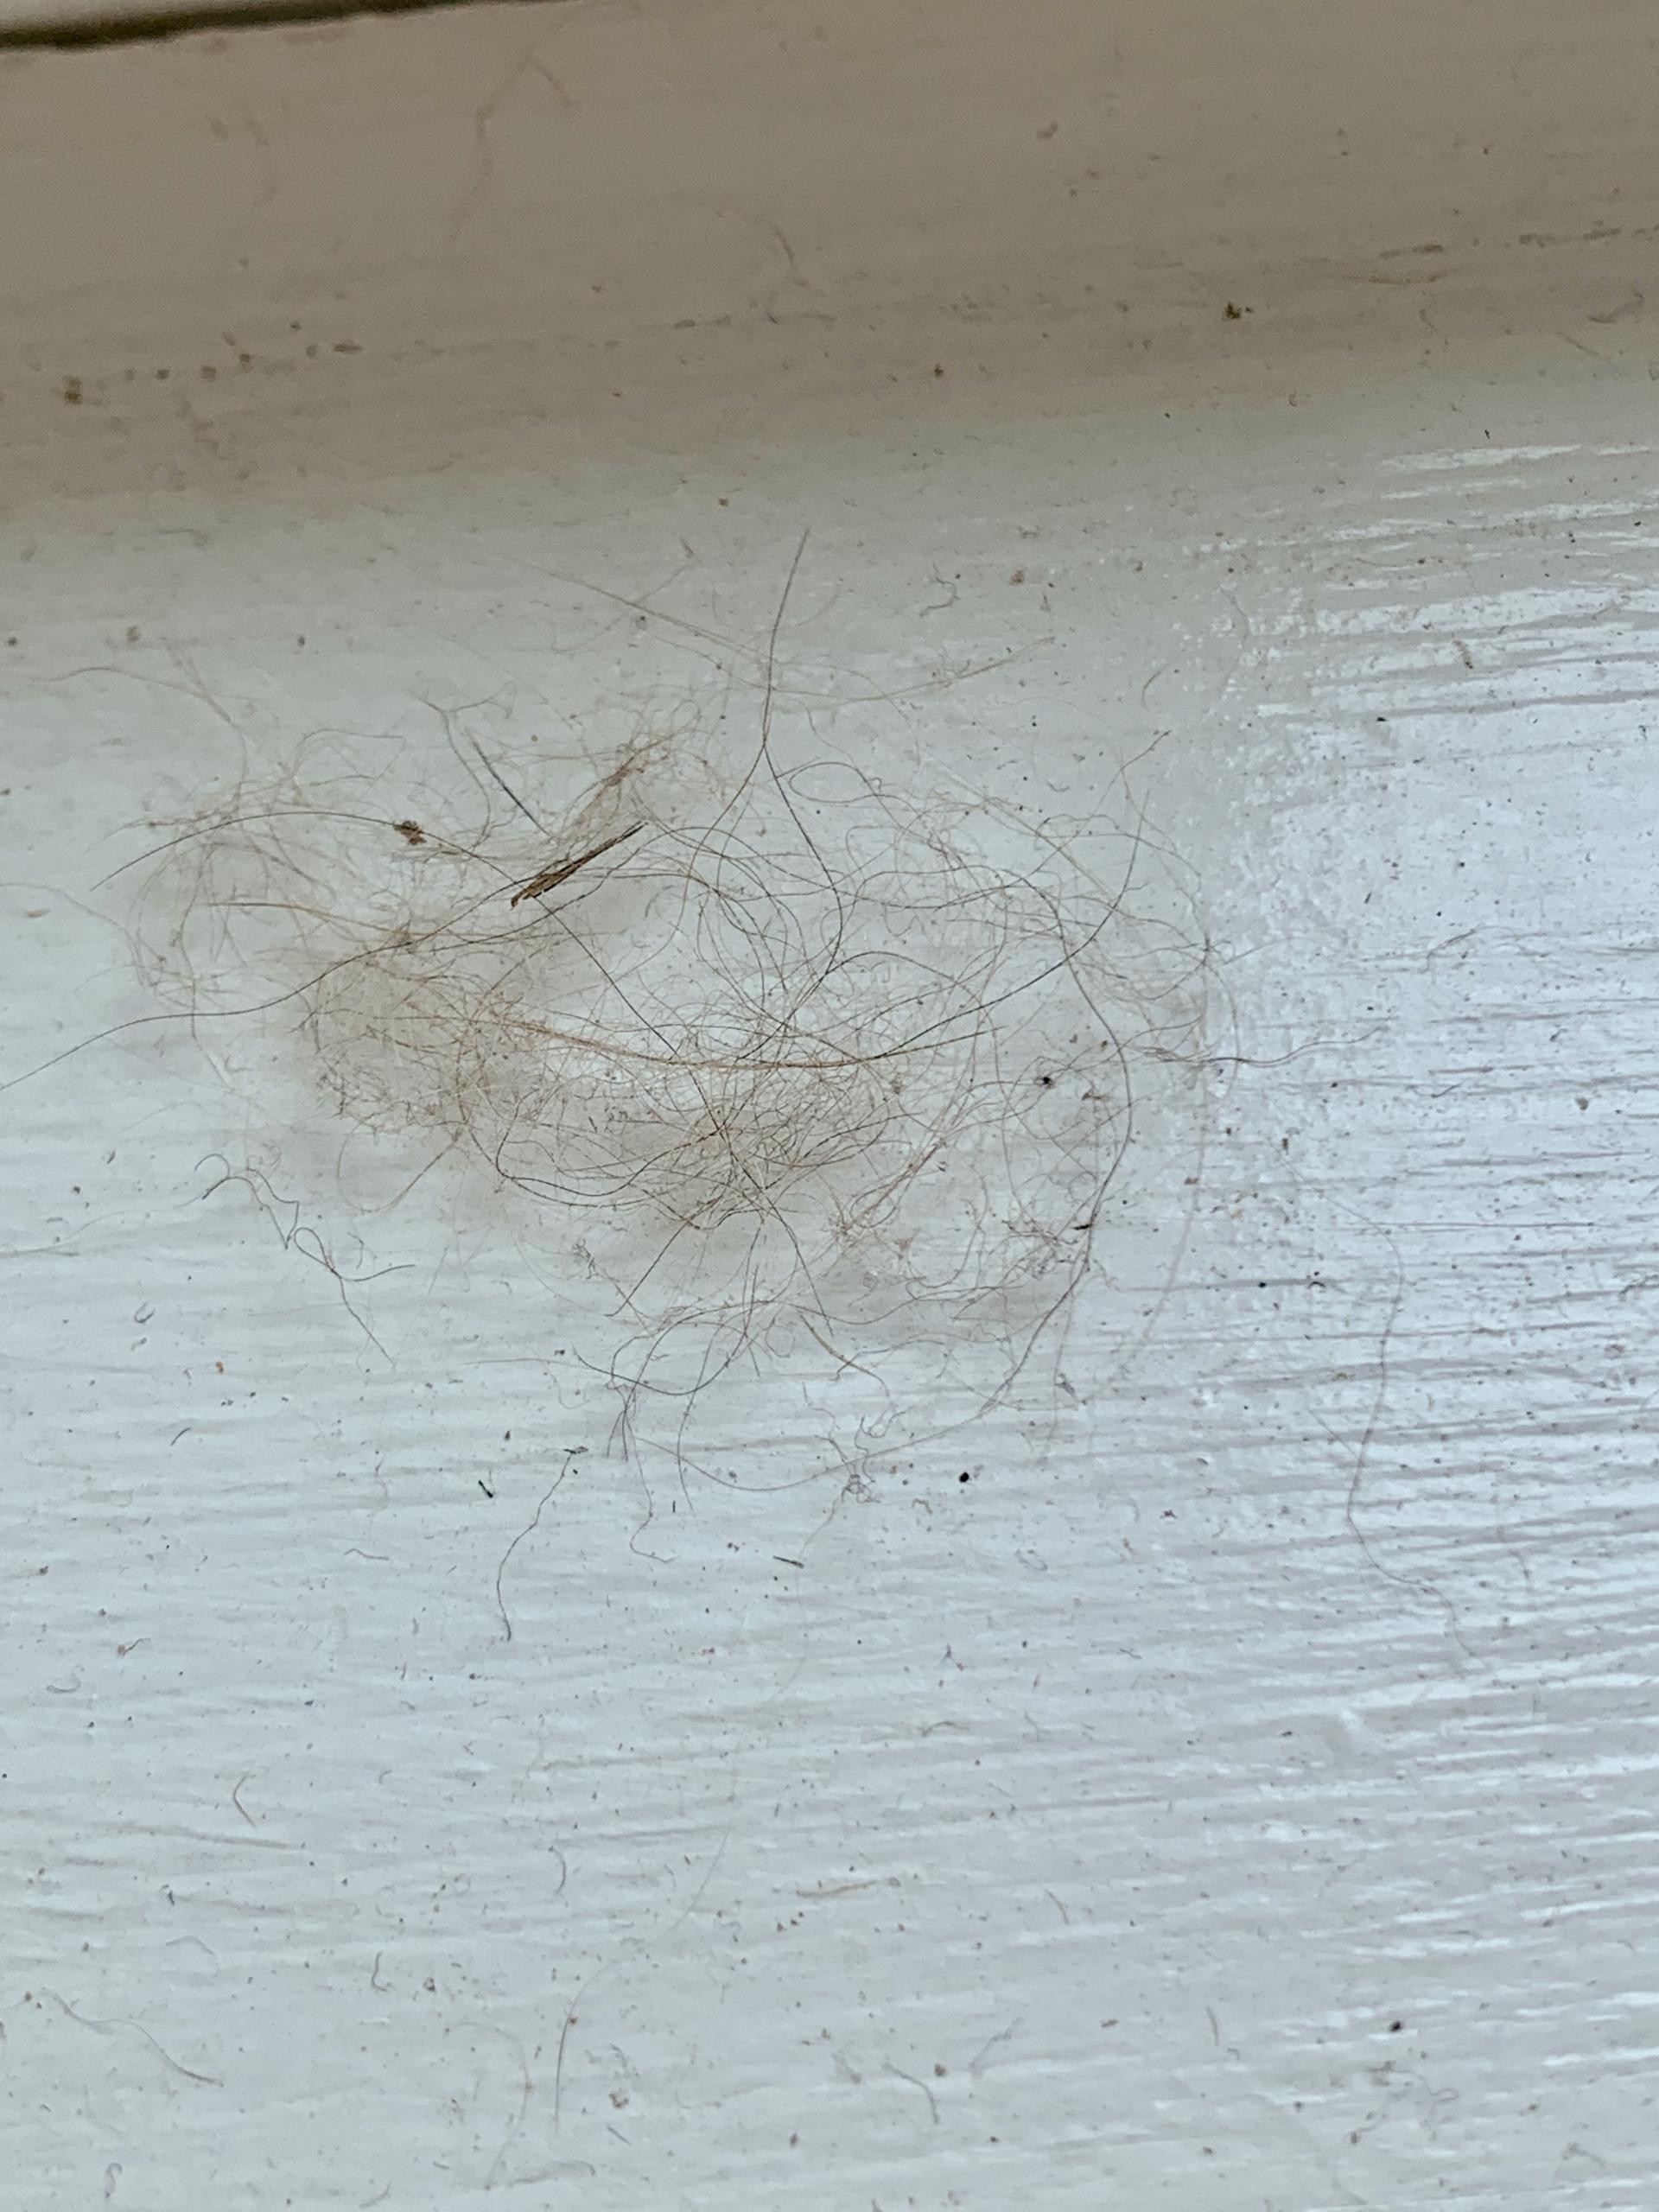 fur on a window sill using airbnb